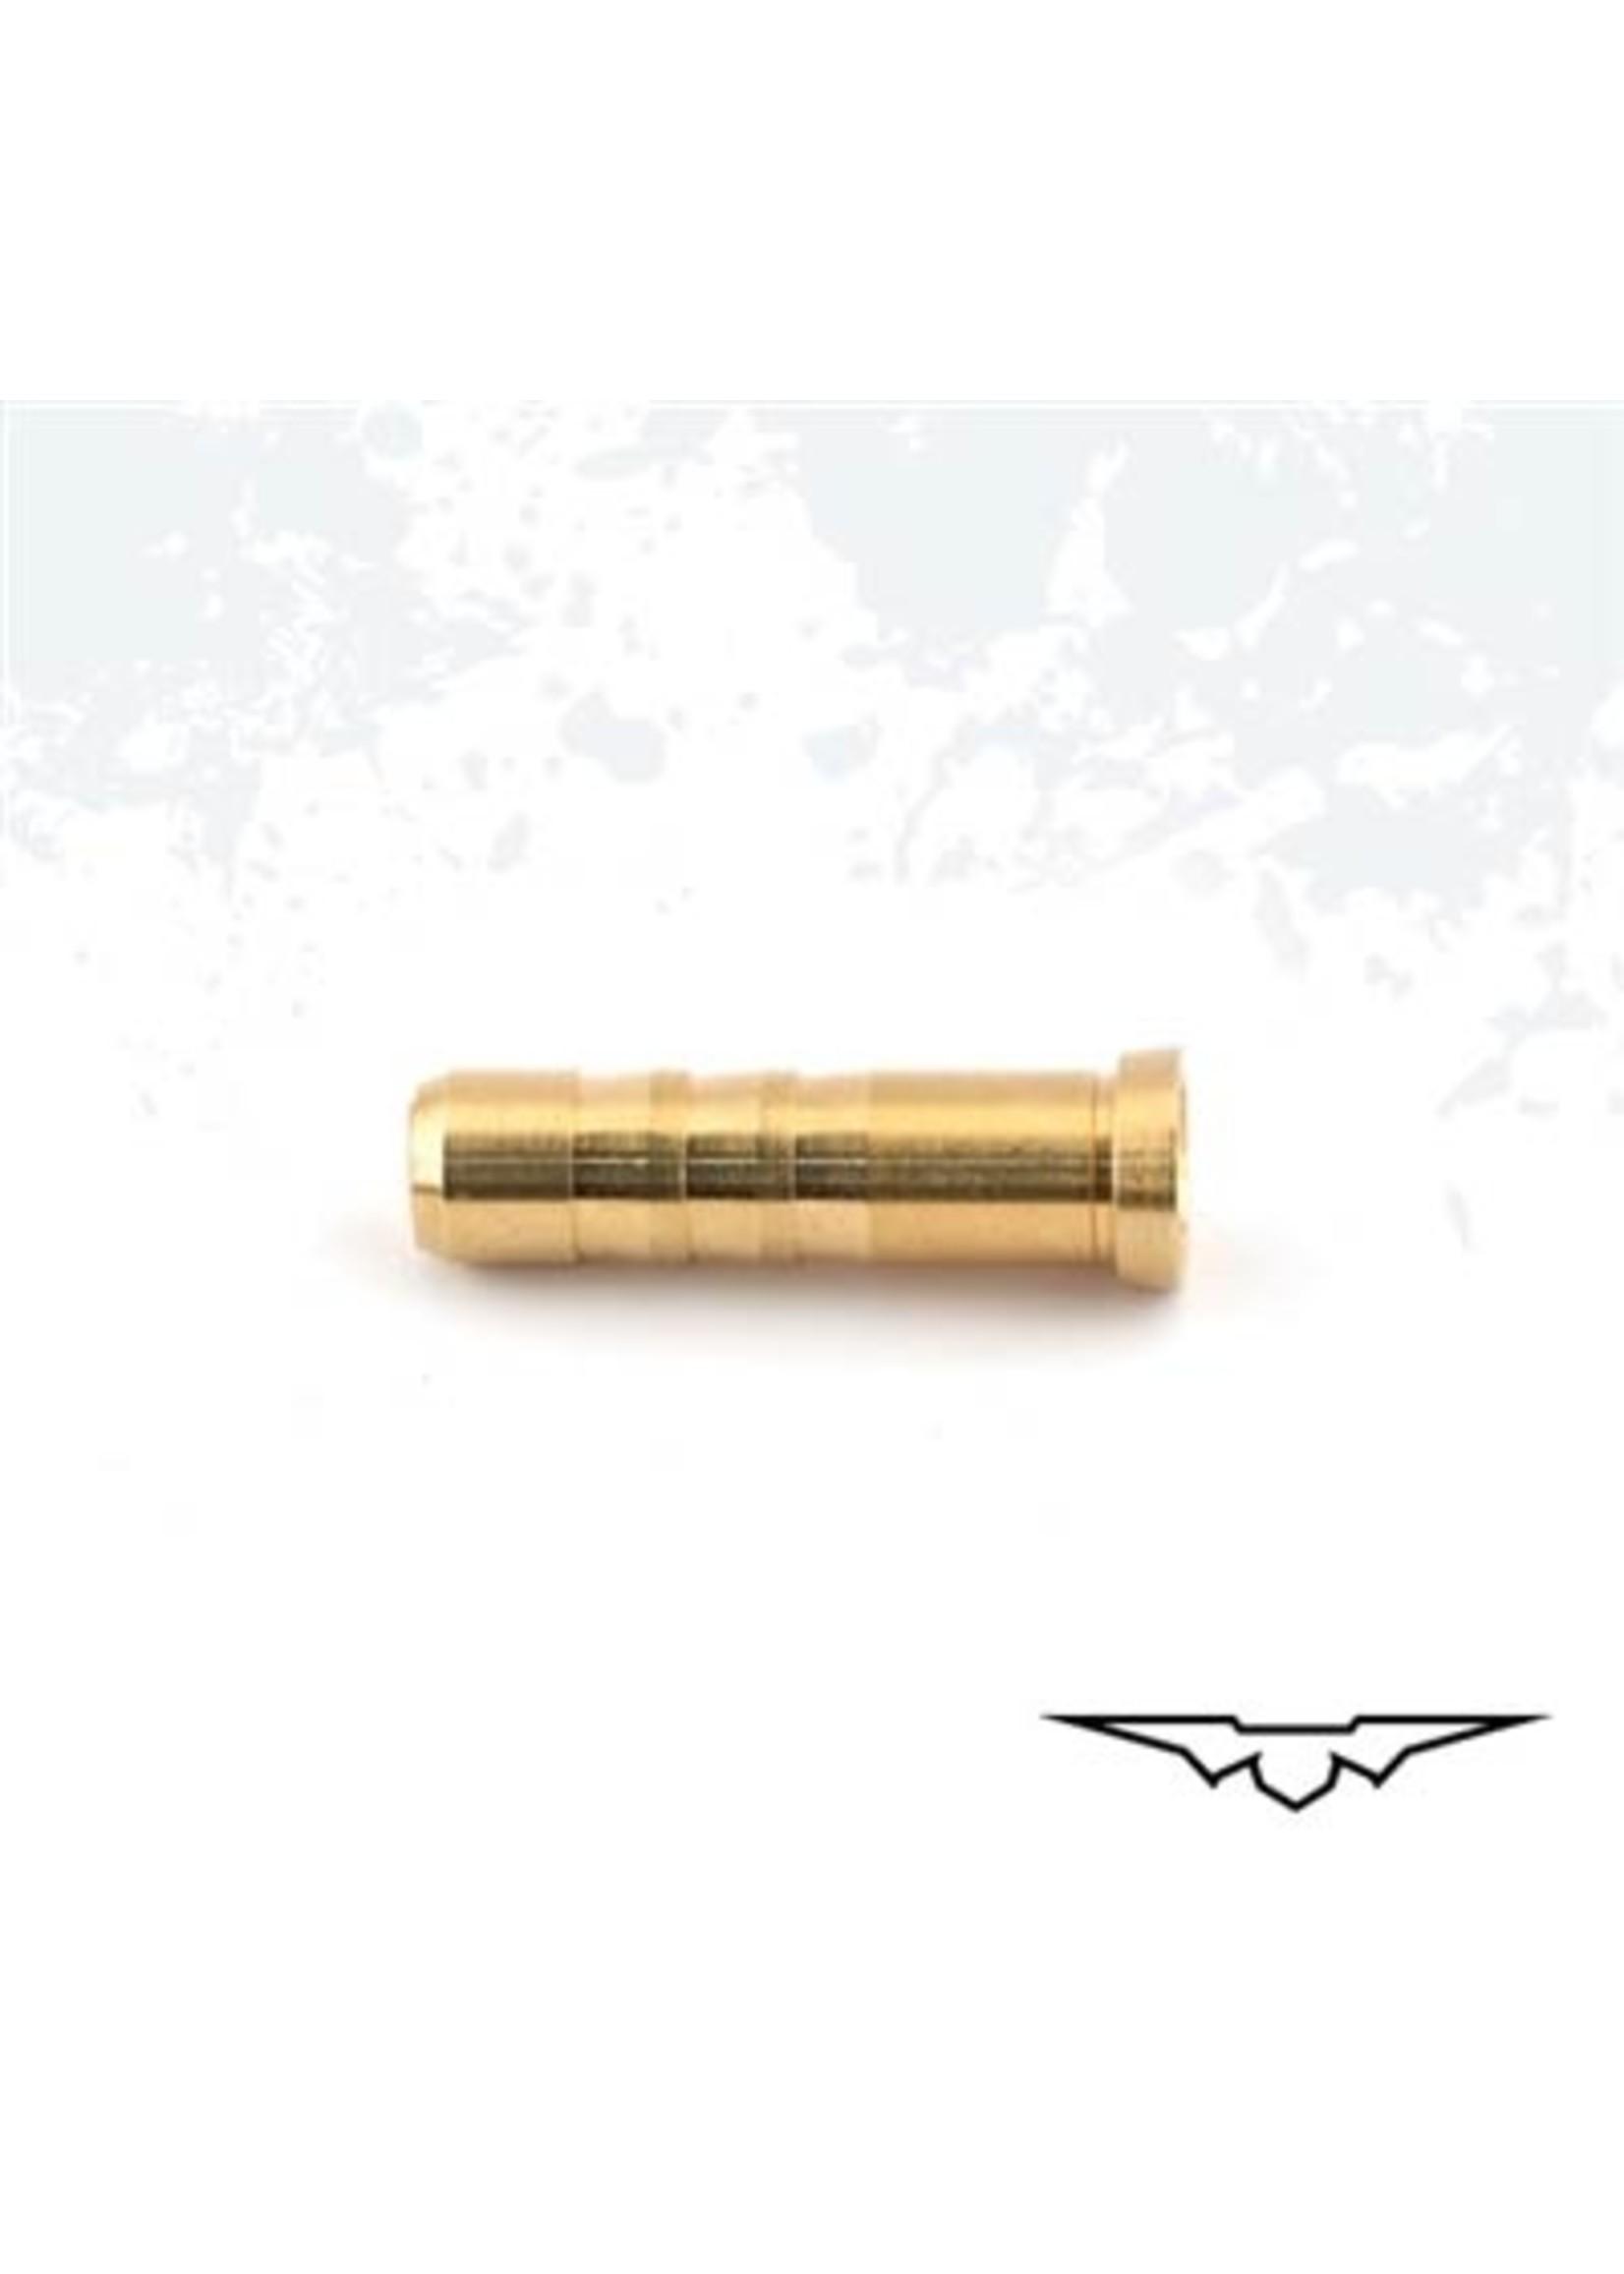 Black Eagle Black Eagle Insert Outlaw Brass 42gr - Each